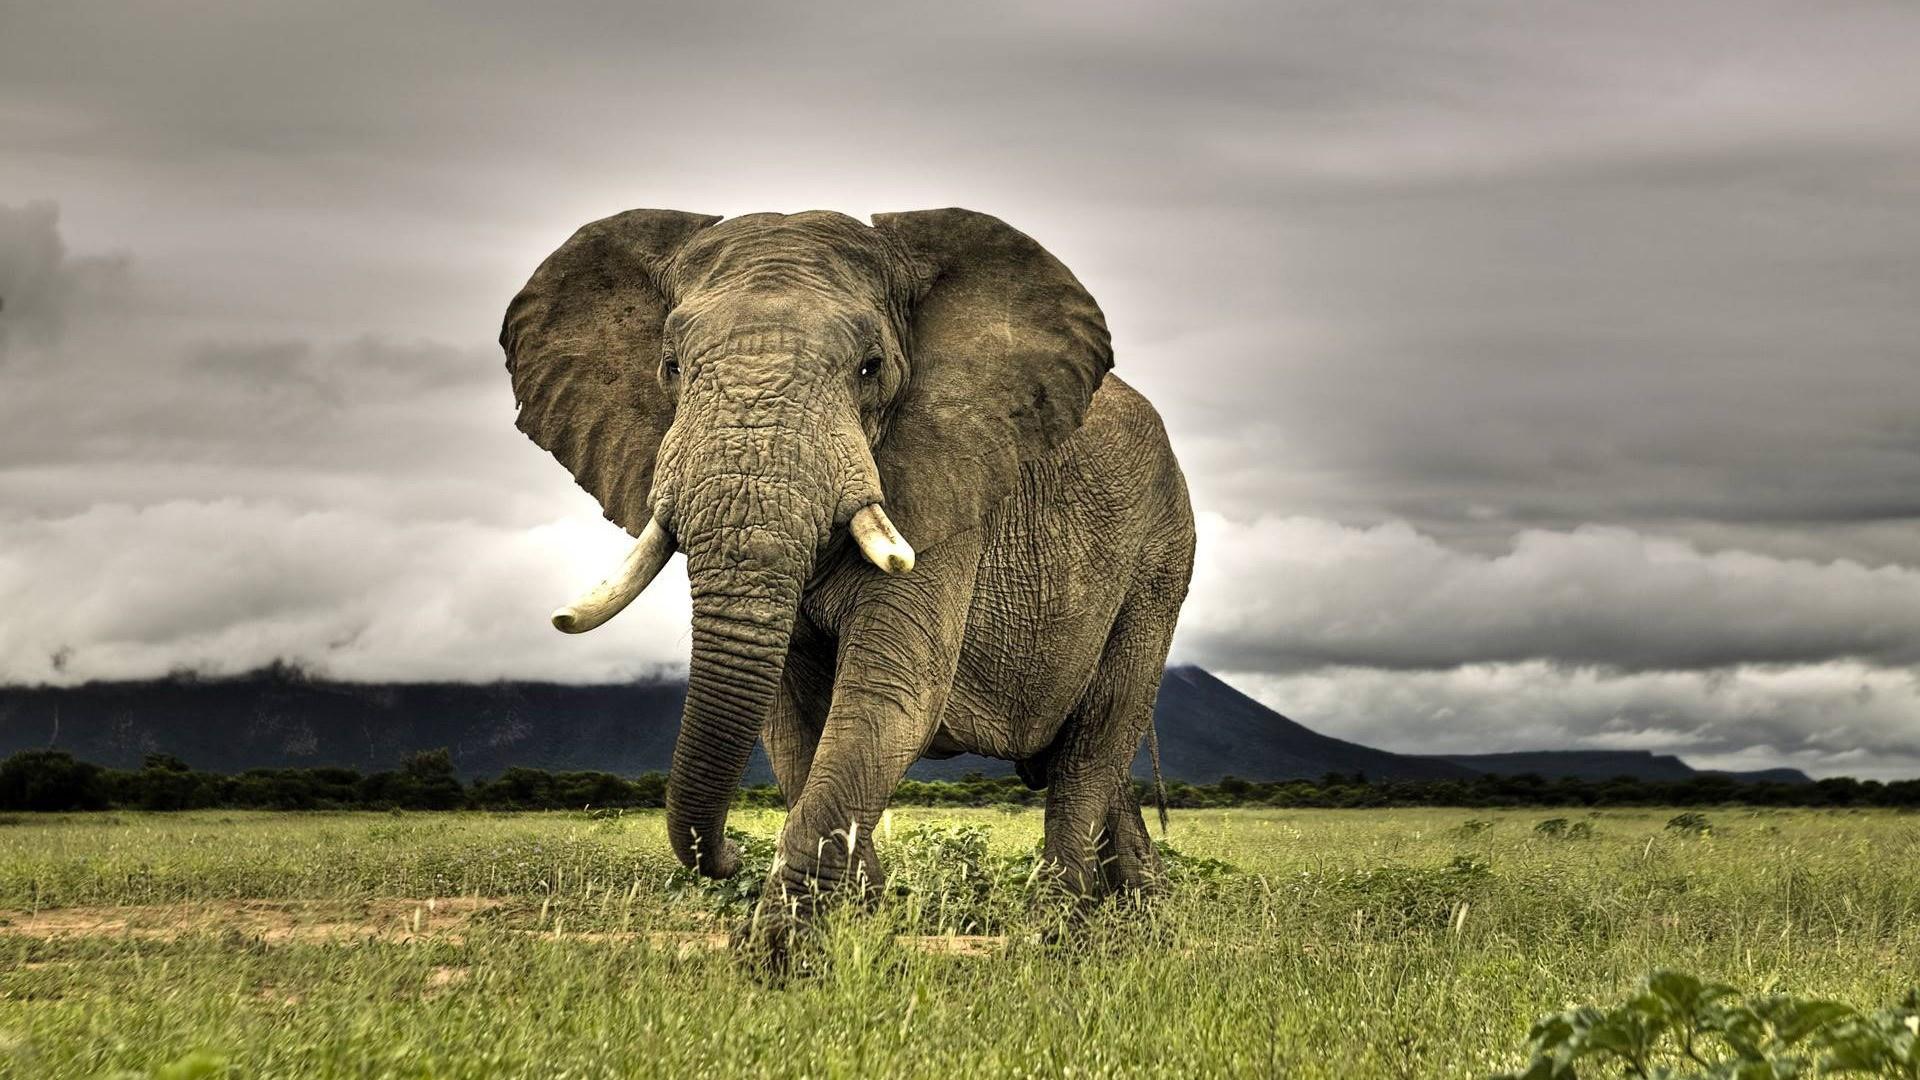 Elephant Wallpaper Elephants Animals Wallpapers